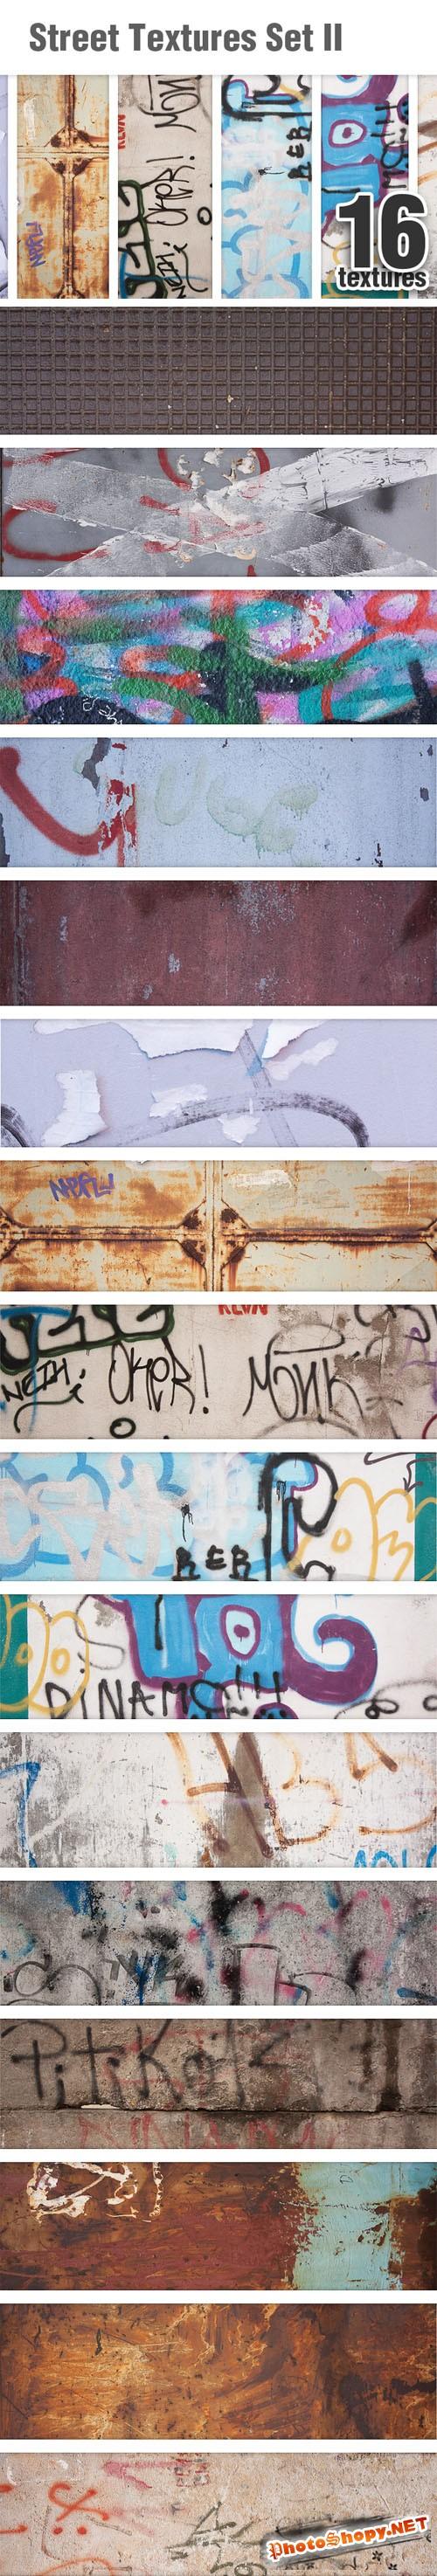 Designtnt - Street Textures Set 2